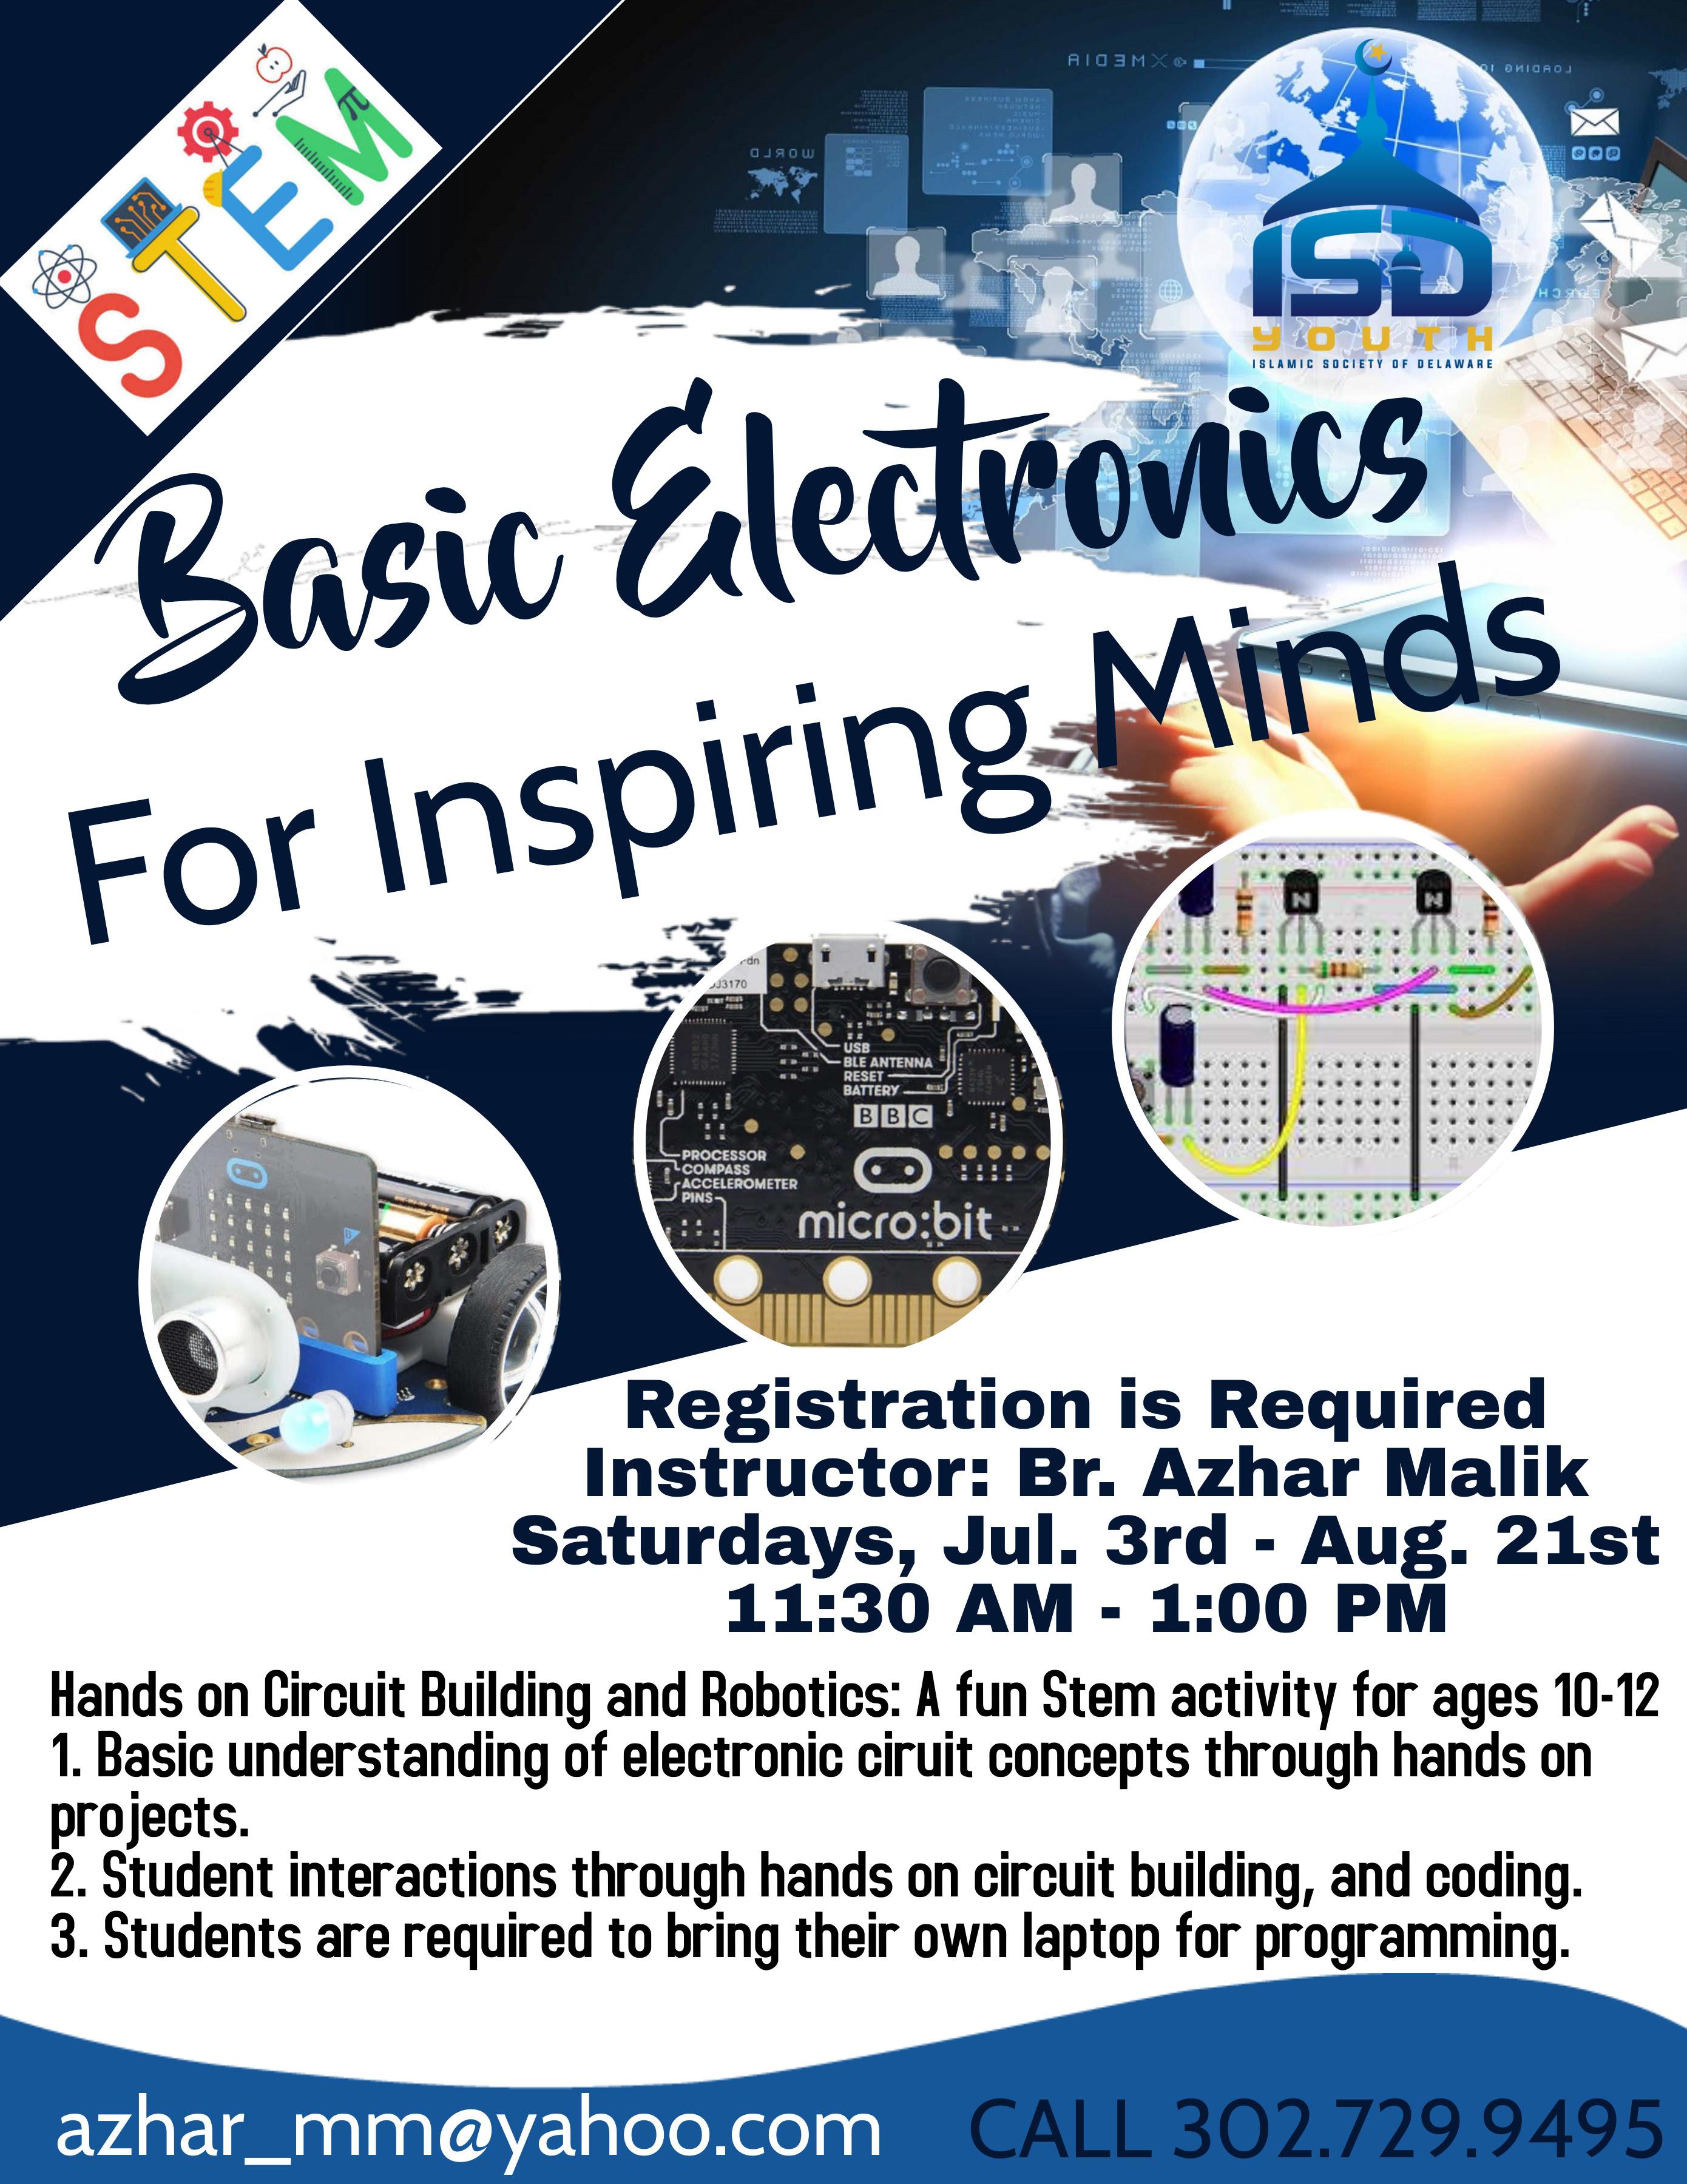 Basic Electronics For Inspiring Minds